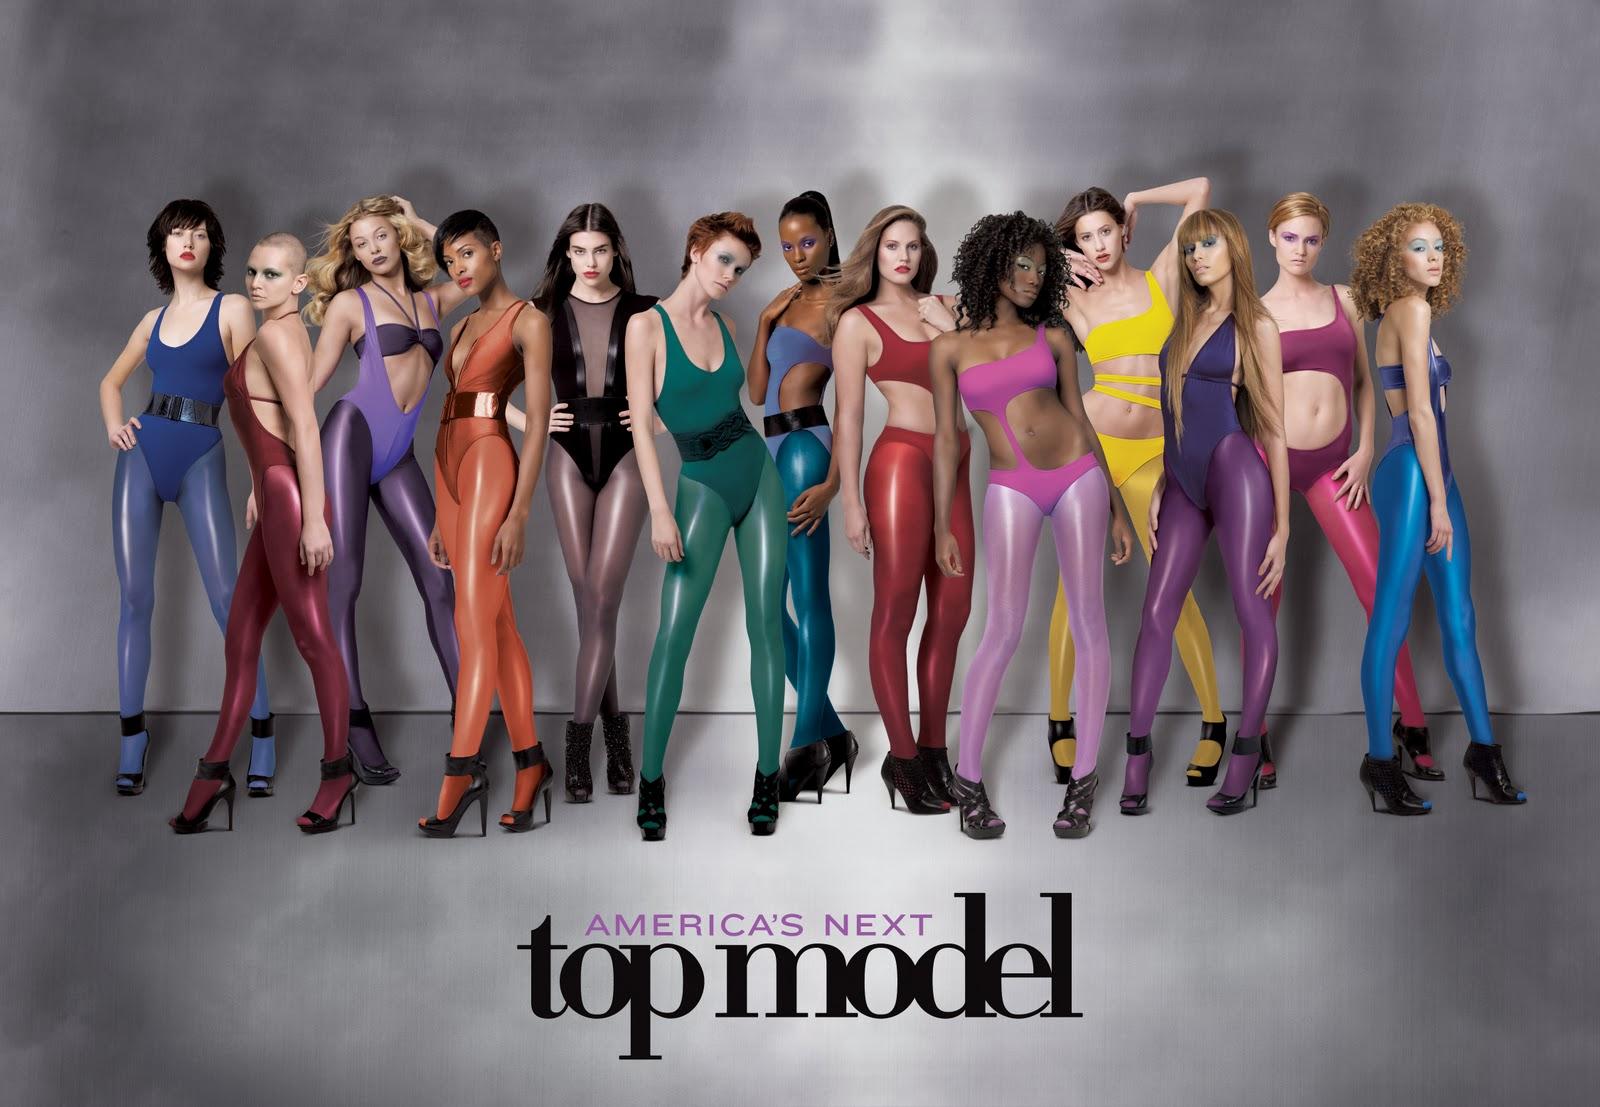 America's Next Top Model: Season 14